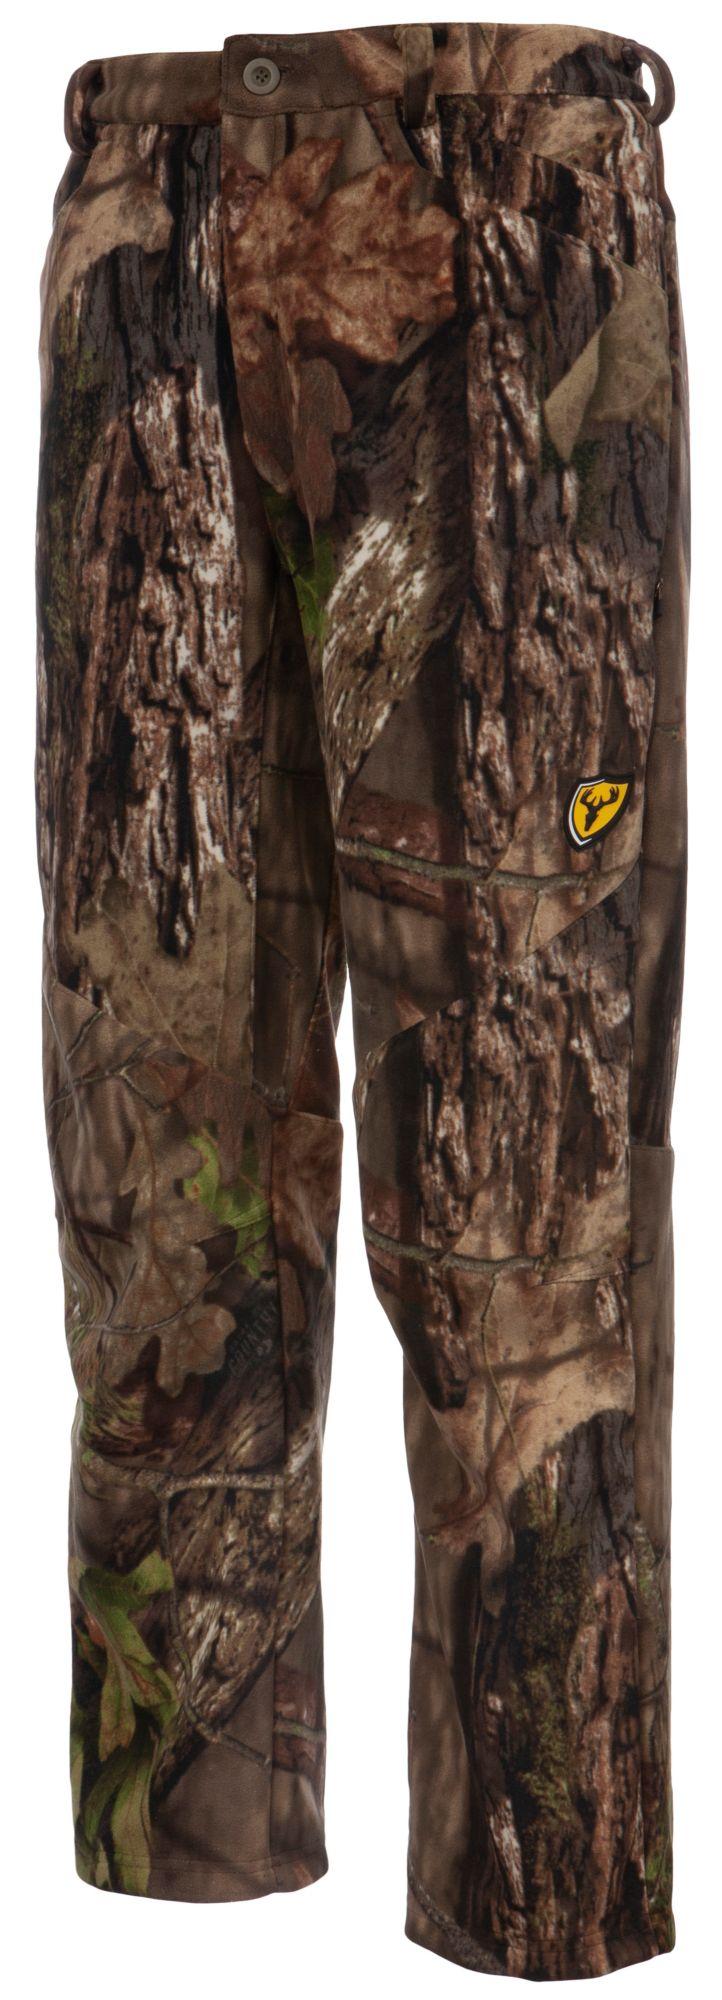 Blocker Outdoors ScentBlocker Men's Adrenaline Pants, Size: Medium, Mossy Oak Country thumbnail